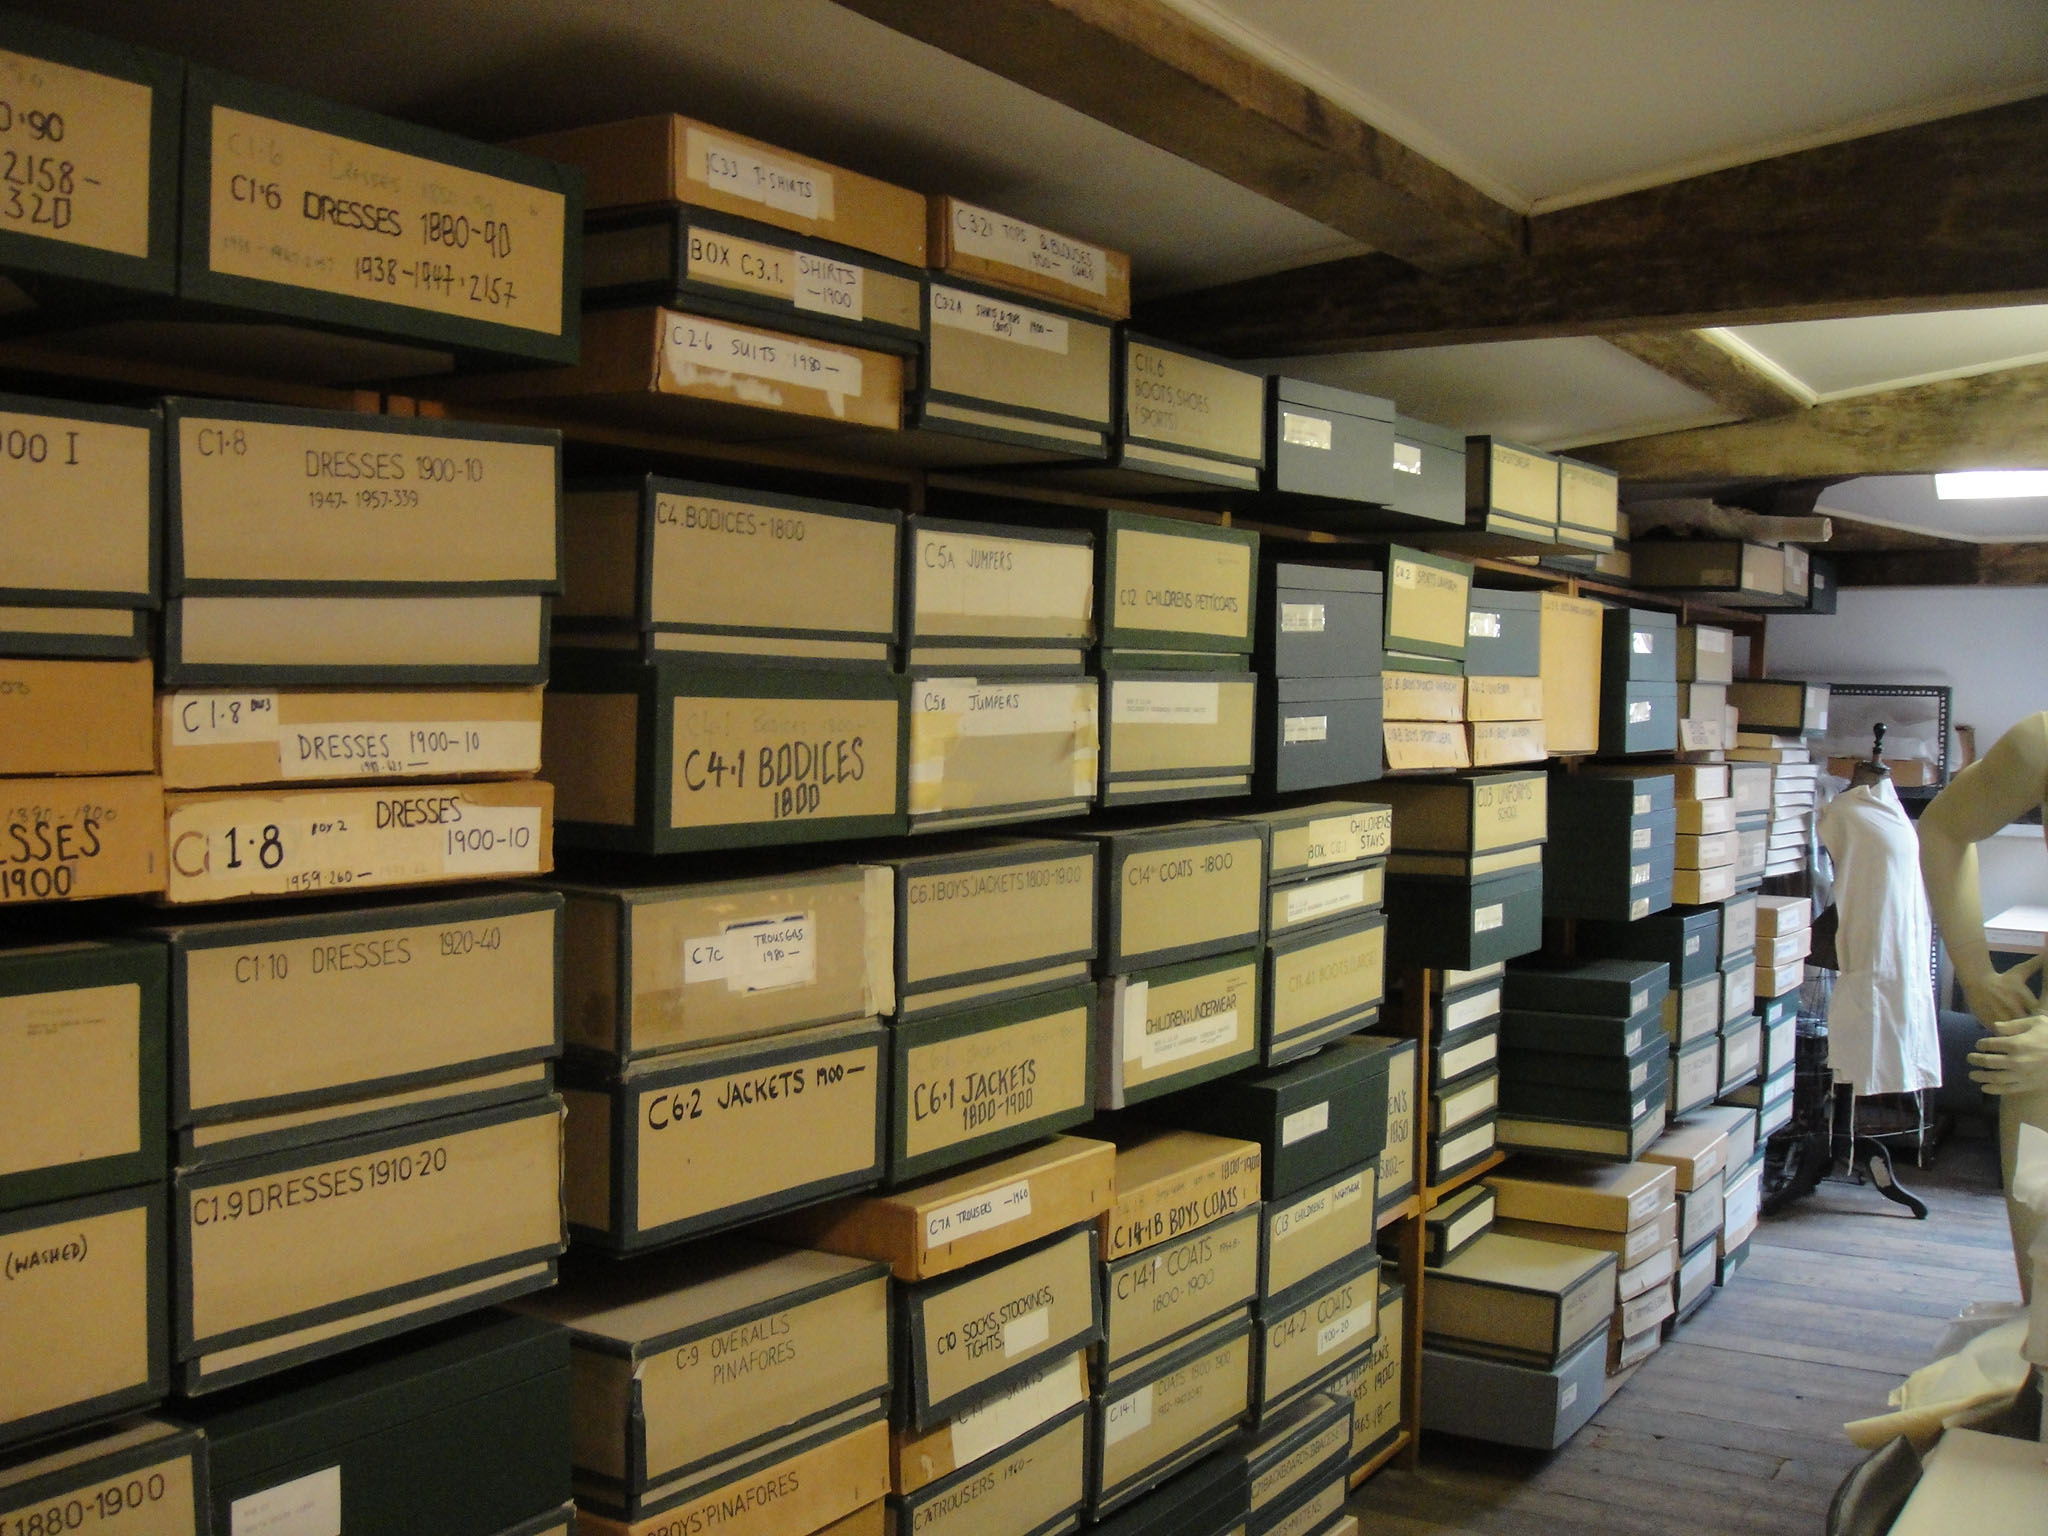 Storage boxes in Platt Hall Attic